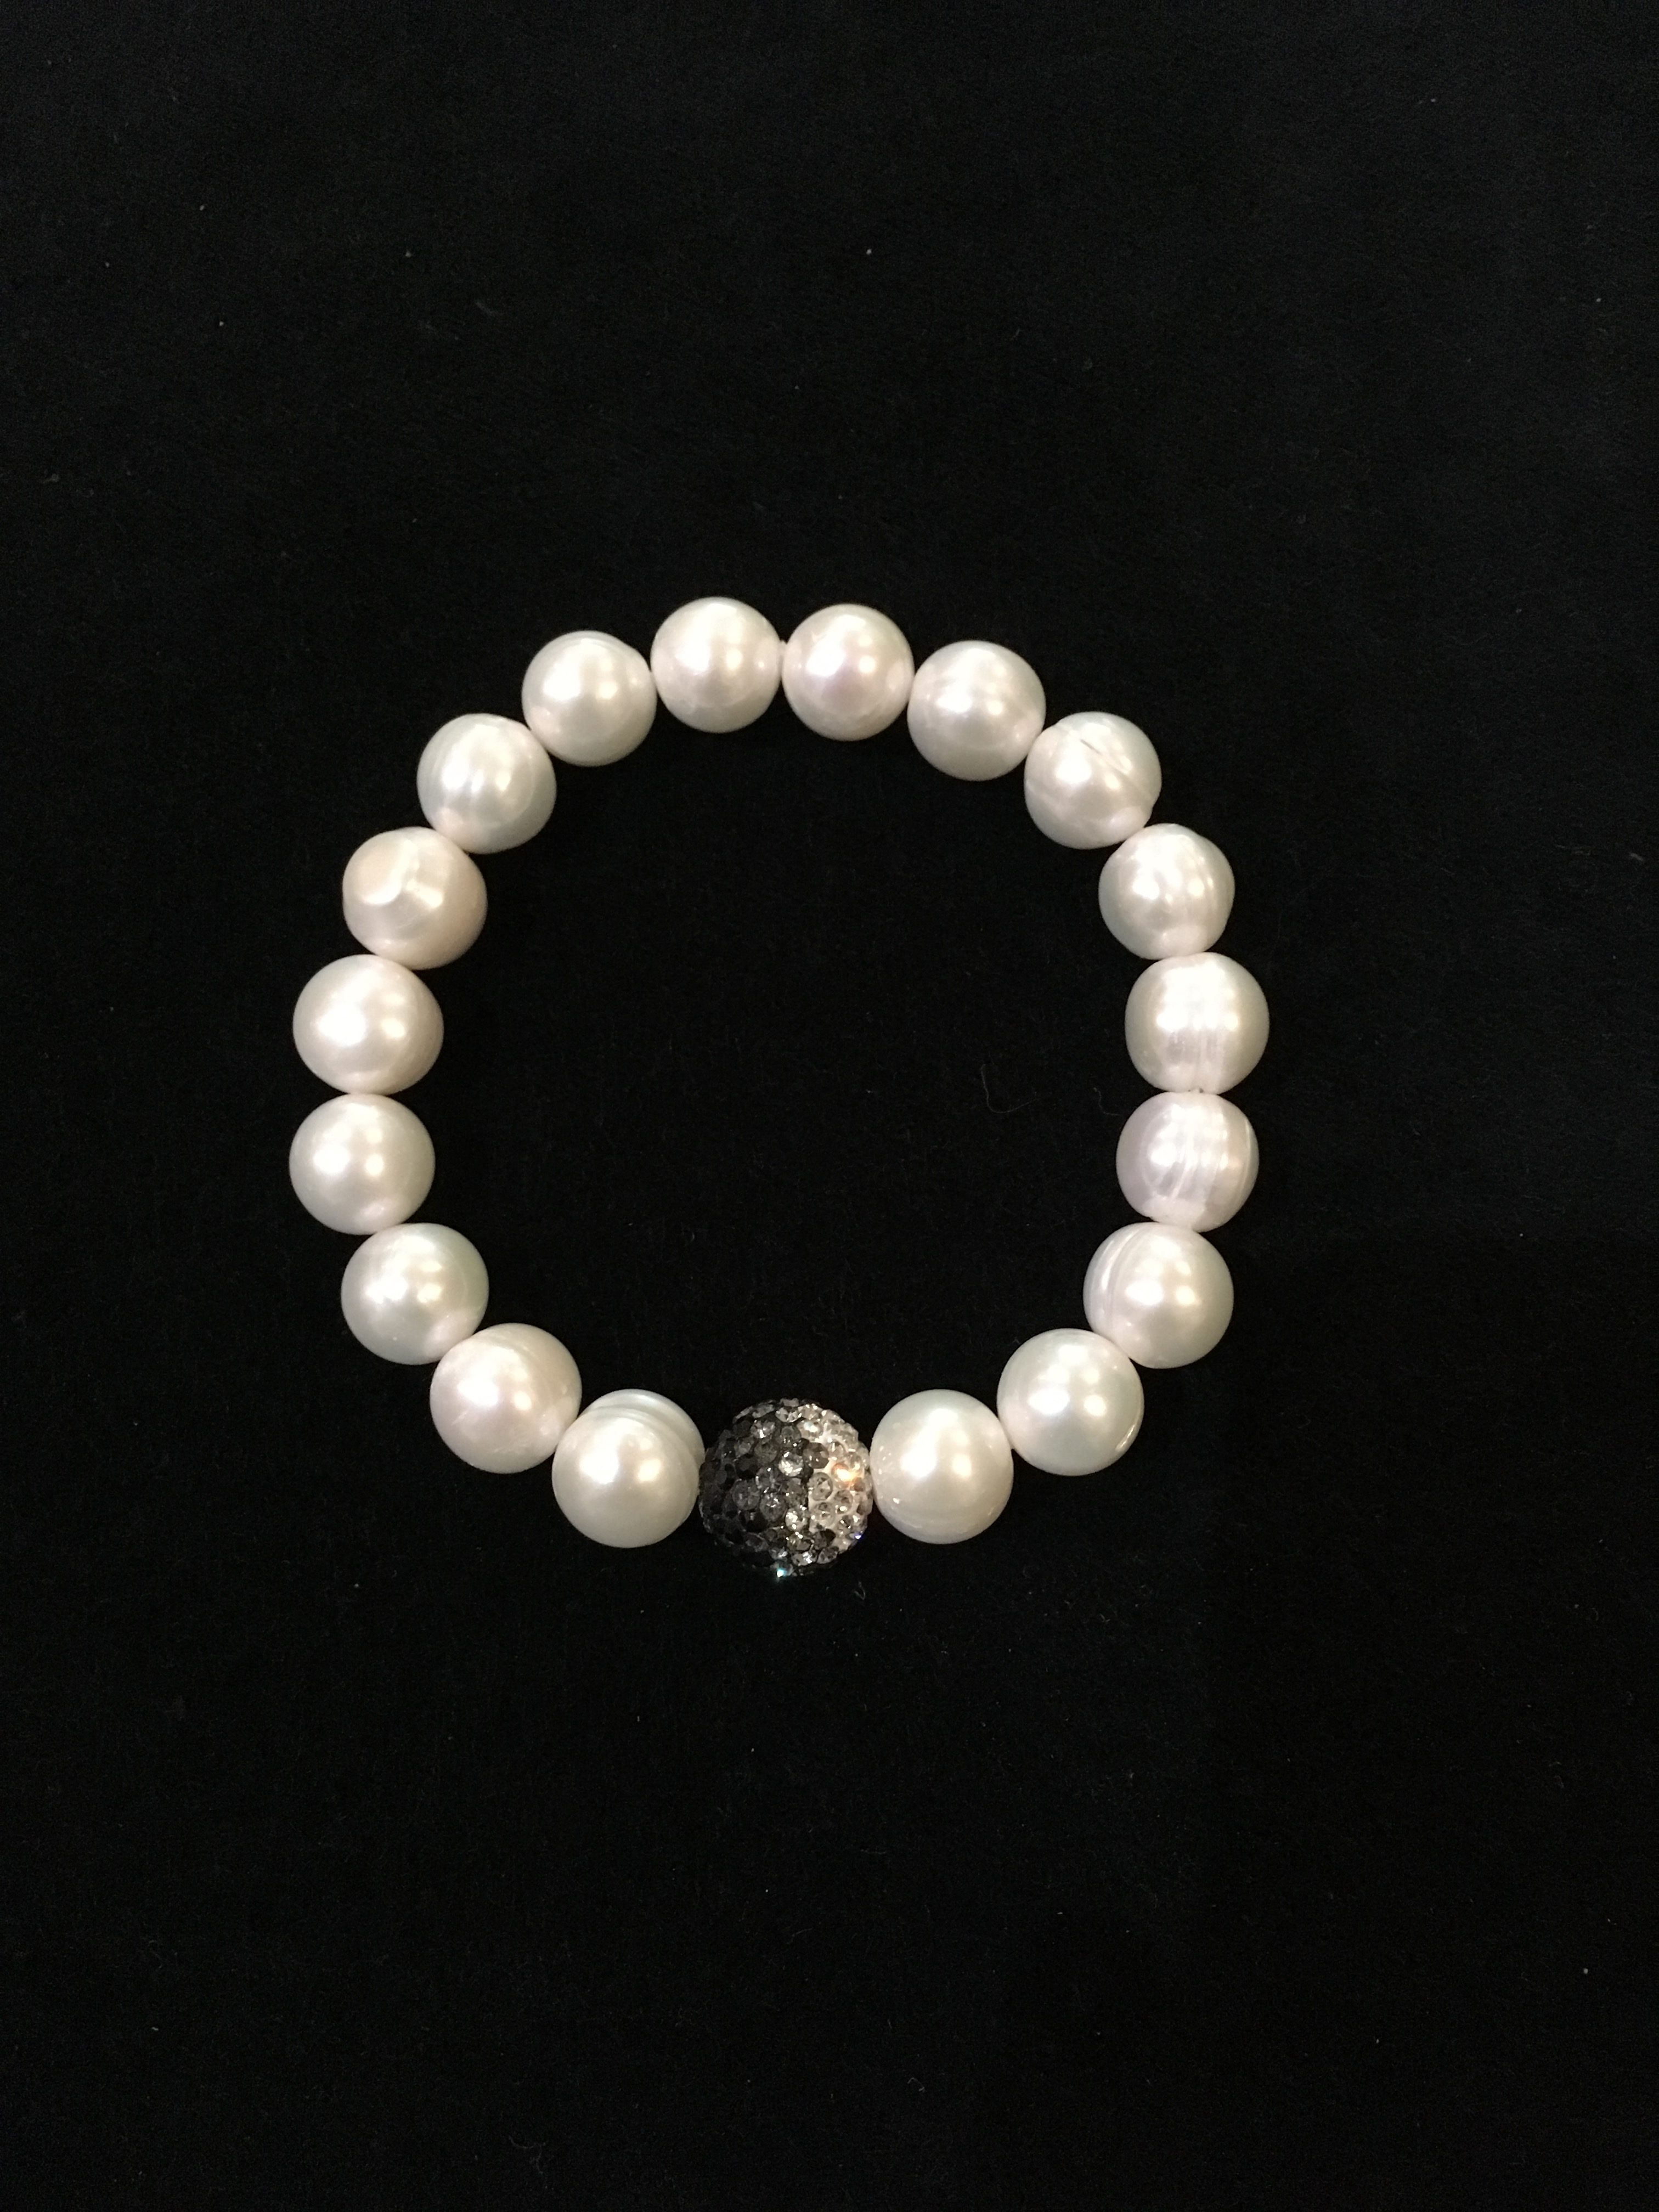 3c831a879e86b Freshwater Pearl & Swarovski Crystal Elastic Bracelet